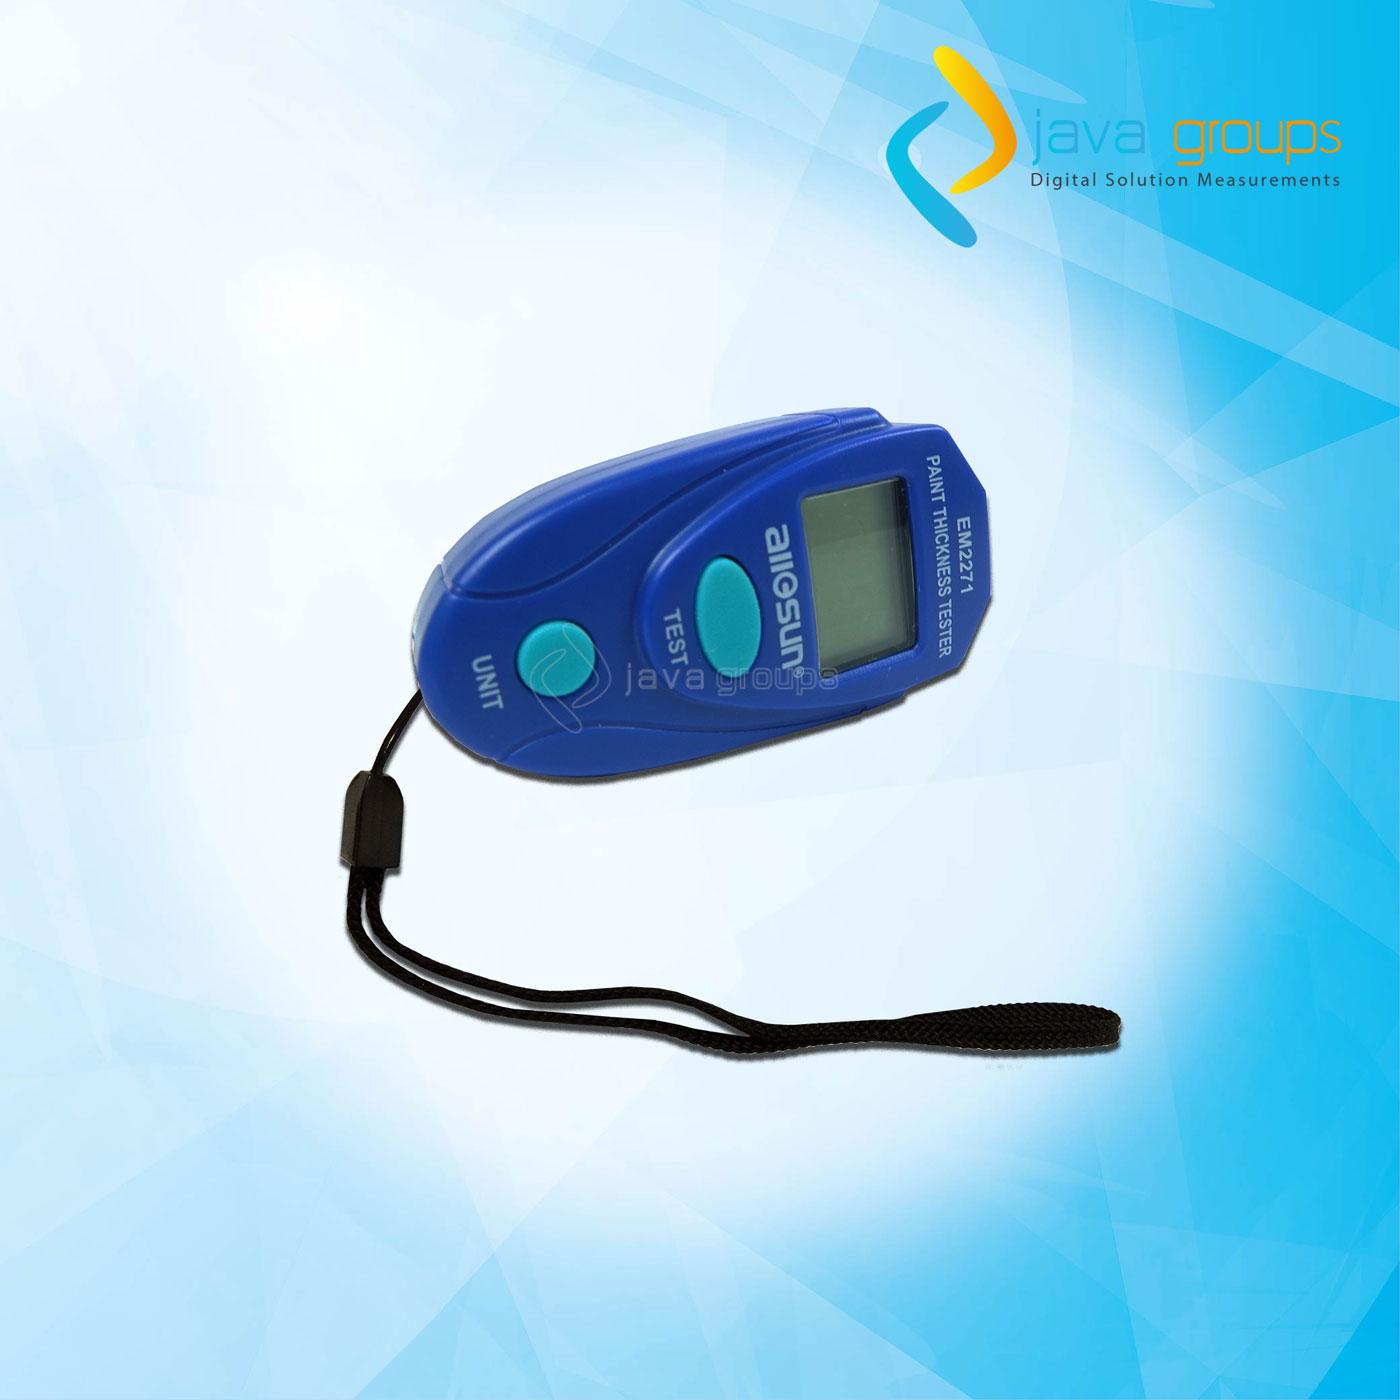 Alat Uji Digital Ketebalan Cat Seri EM2271